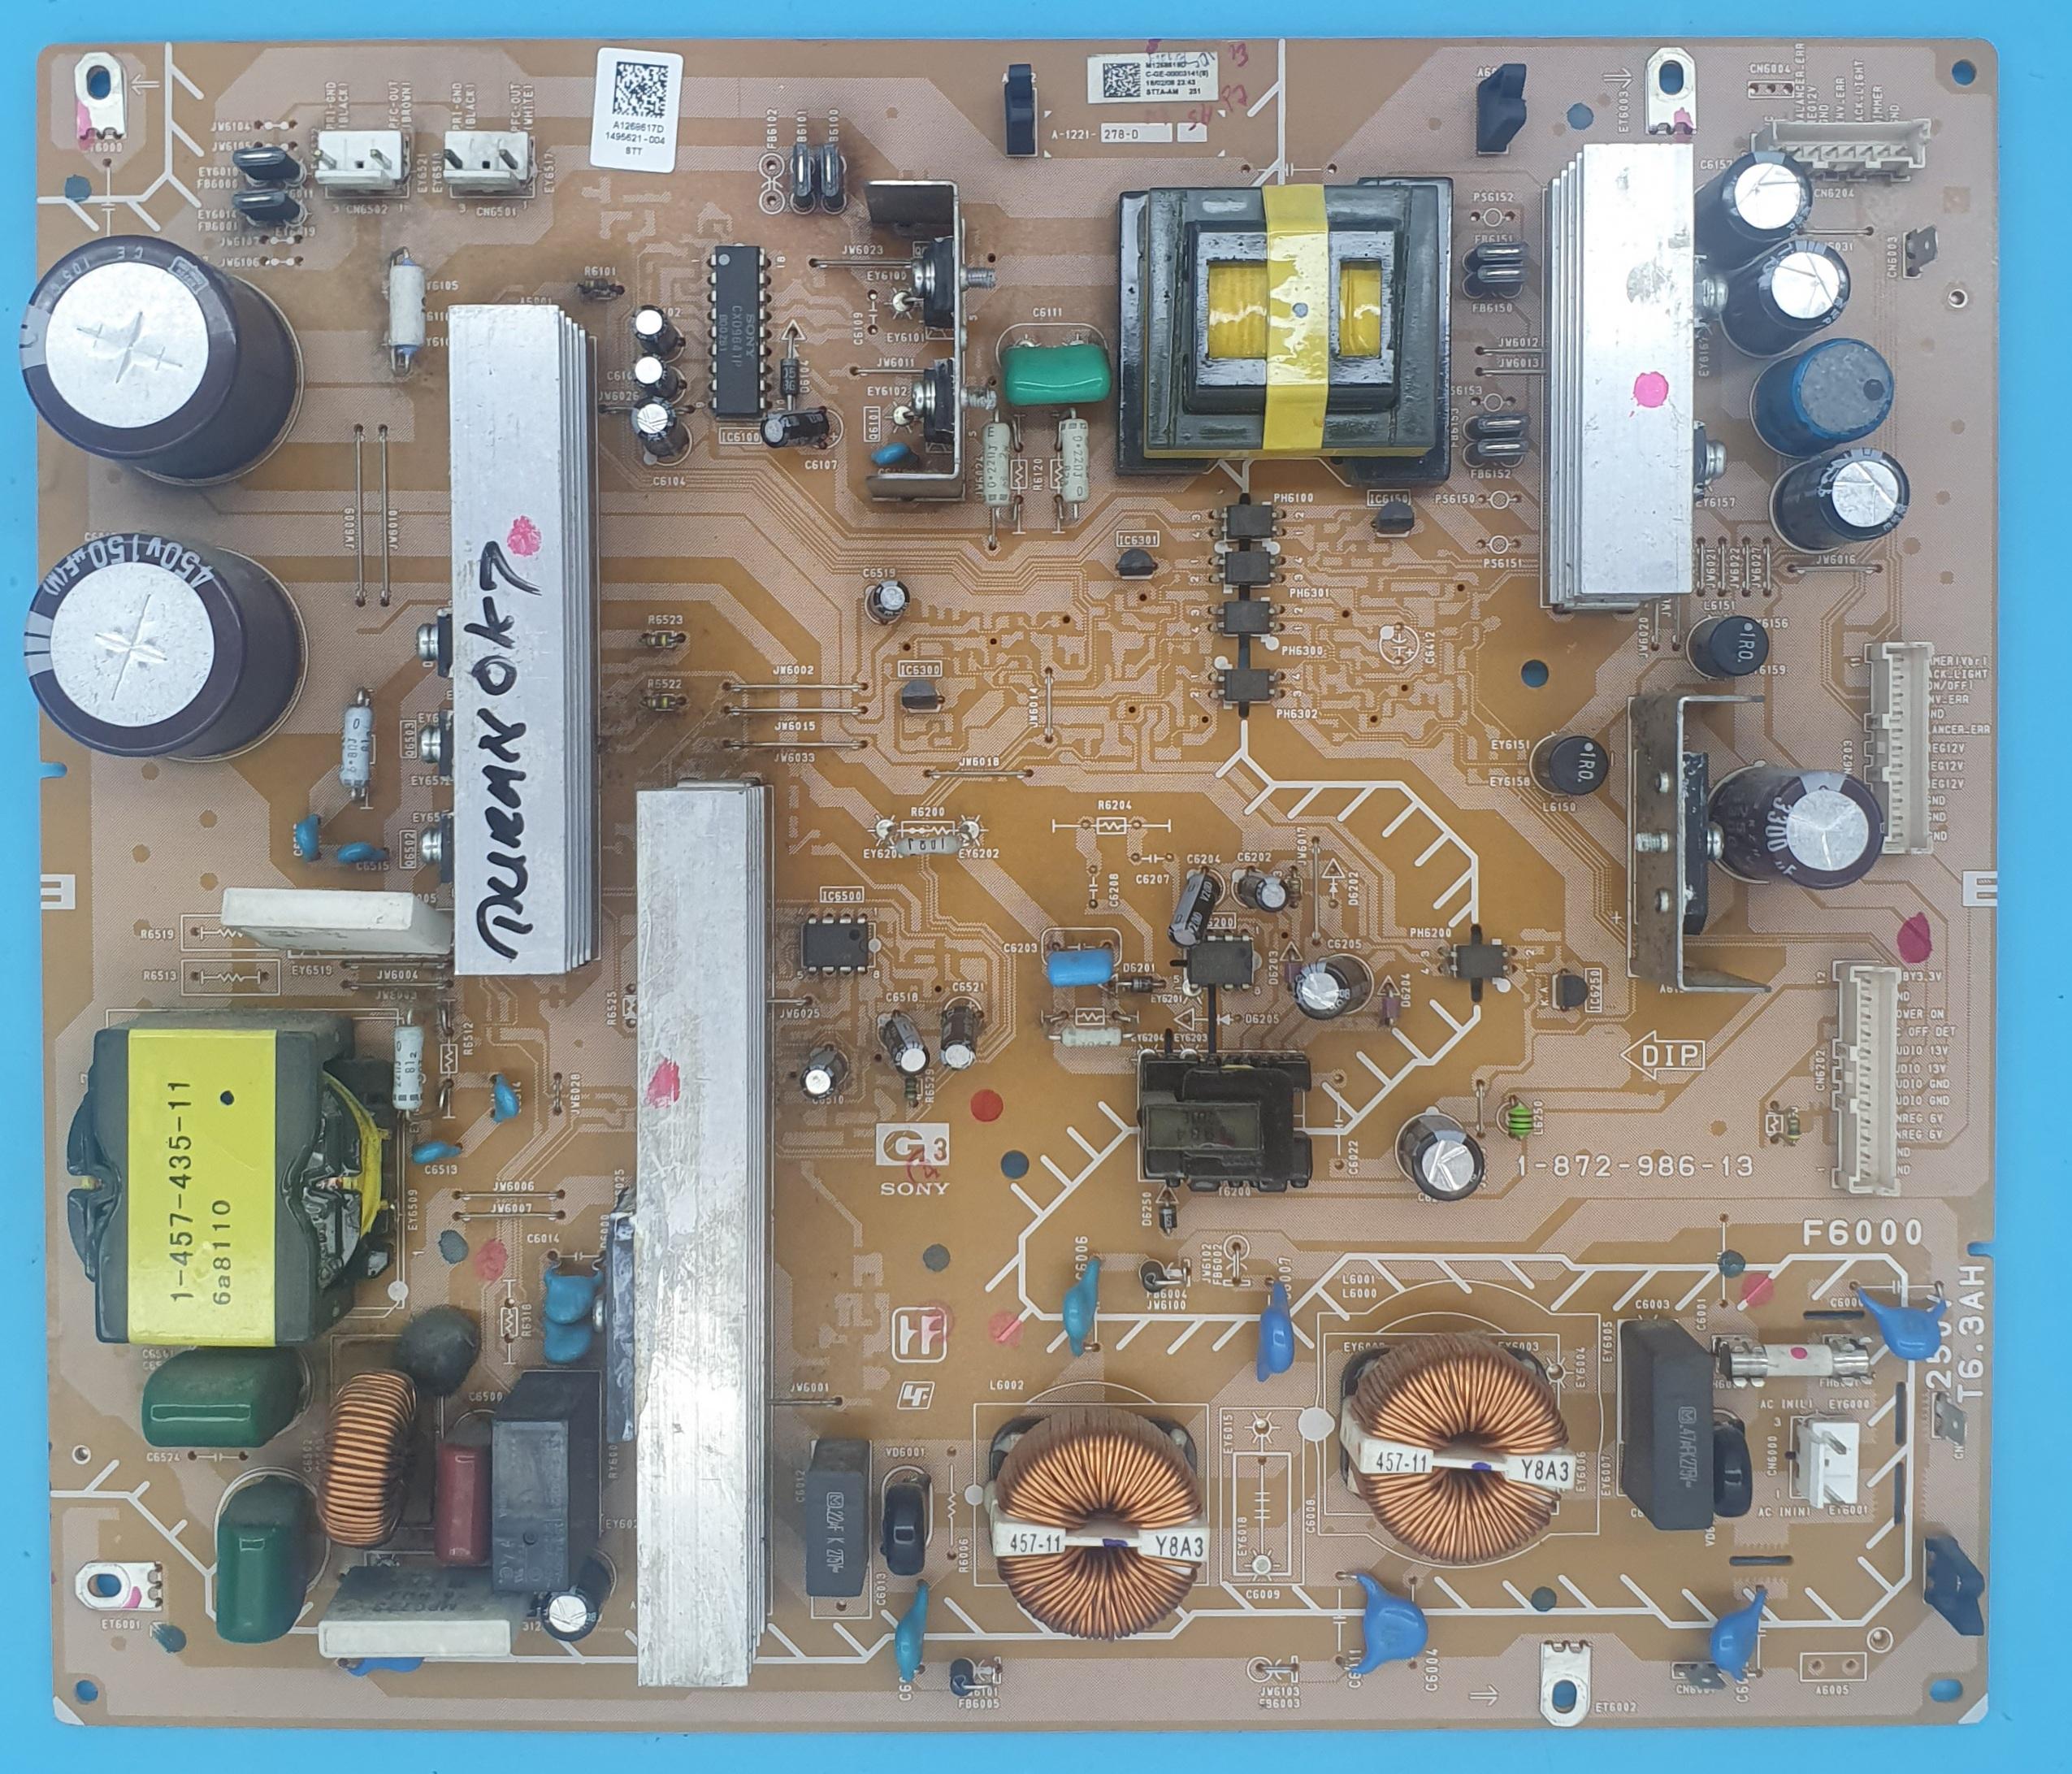 1-872-986-13 Sony Power (KDV DAHİL = 100 TL)